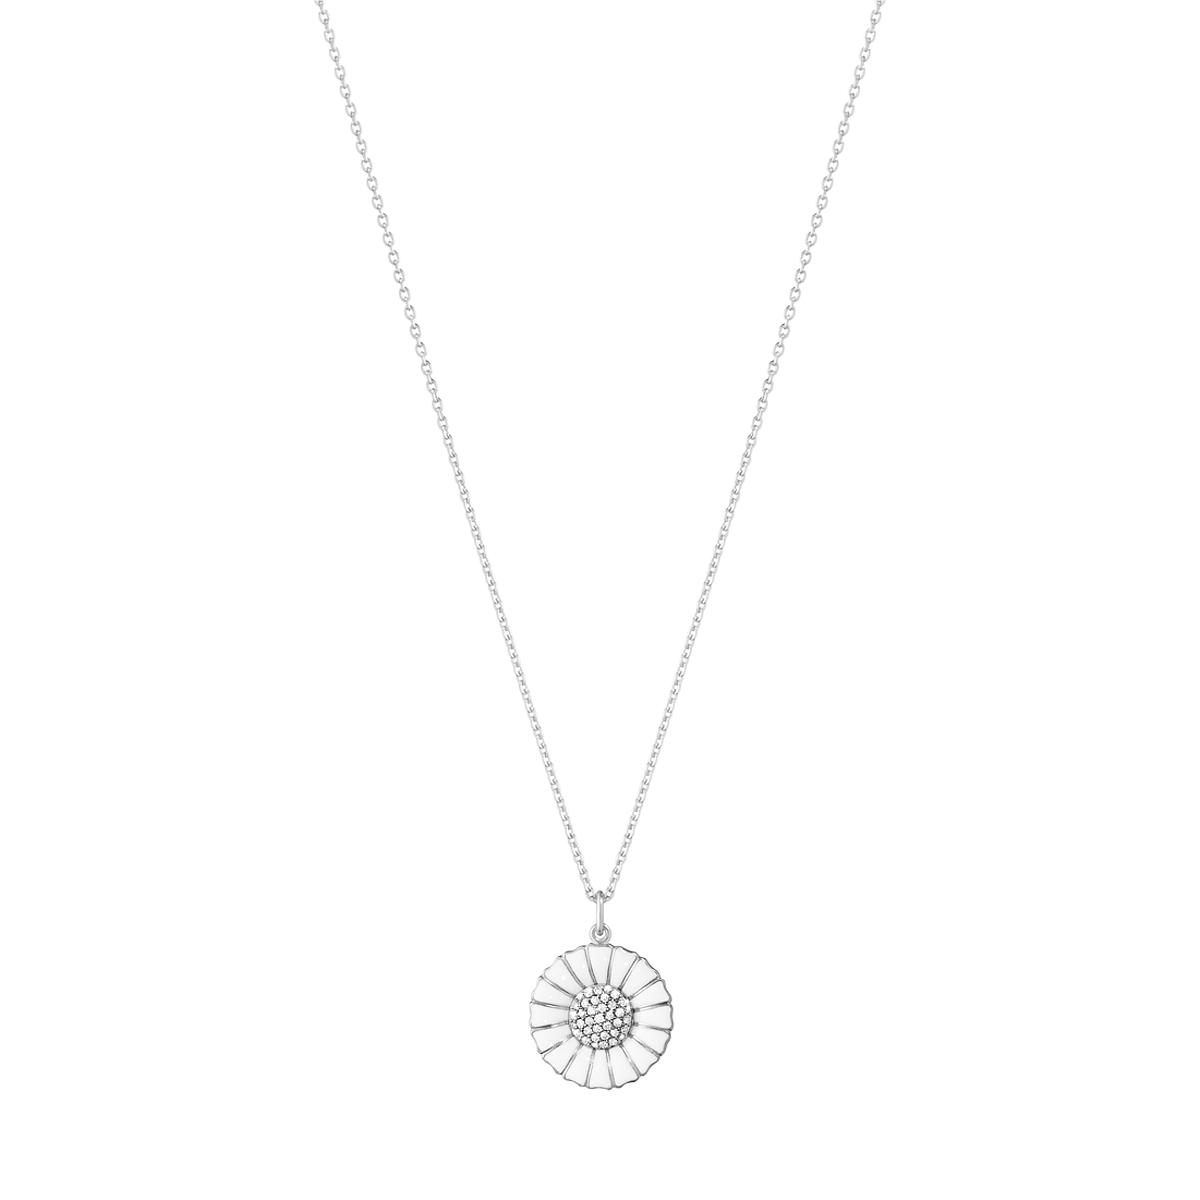 Georg Jensen Daisy halskæde m/diamanter 10010536